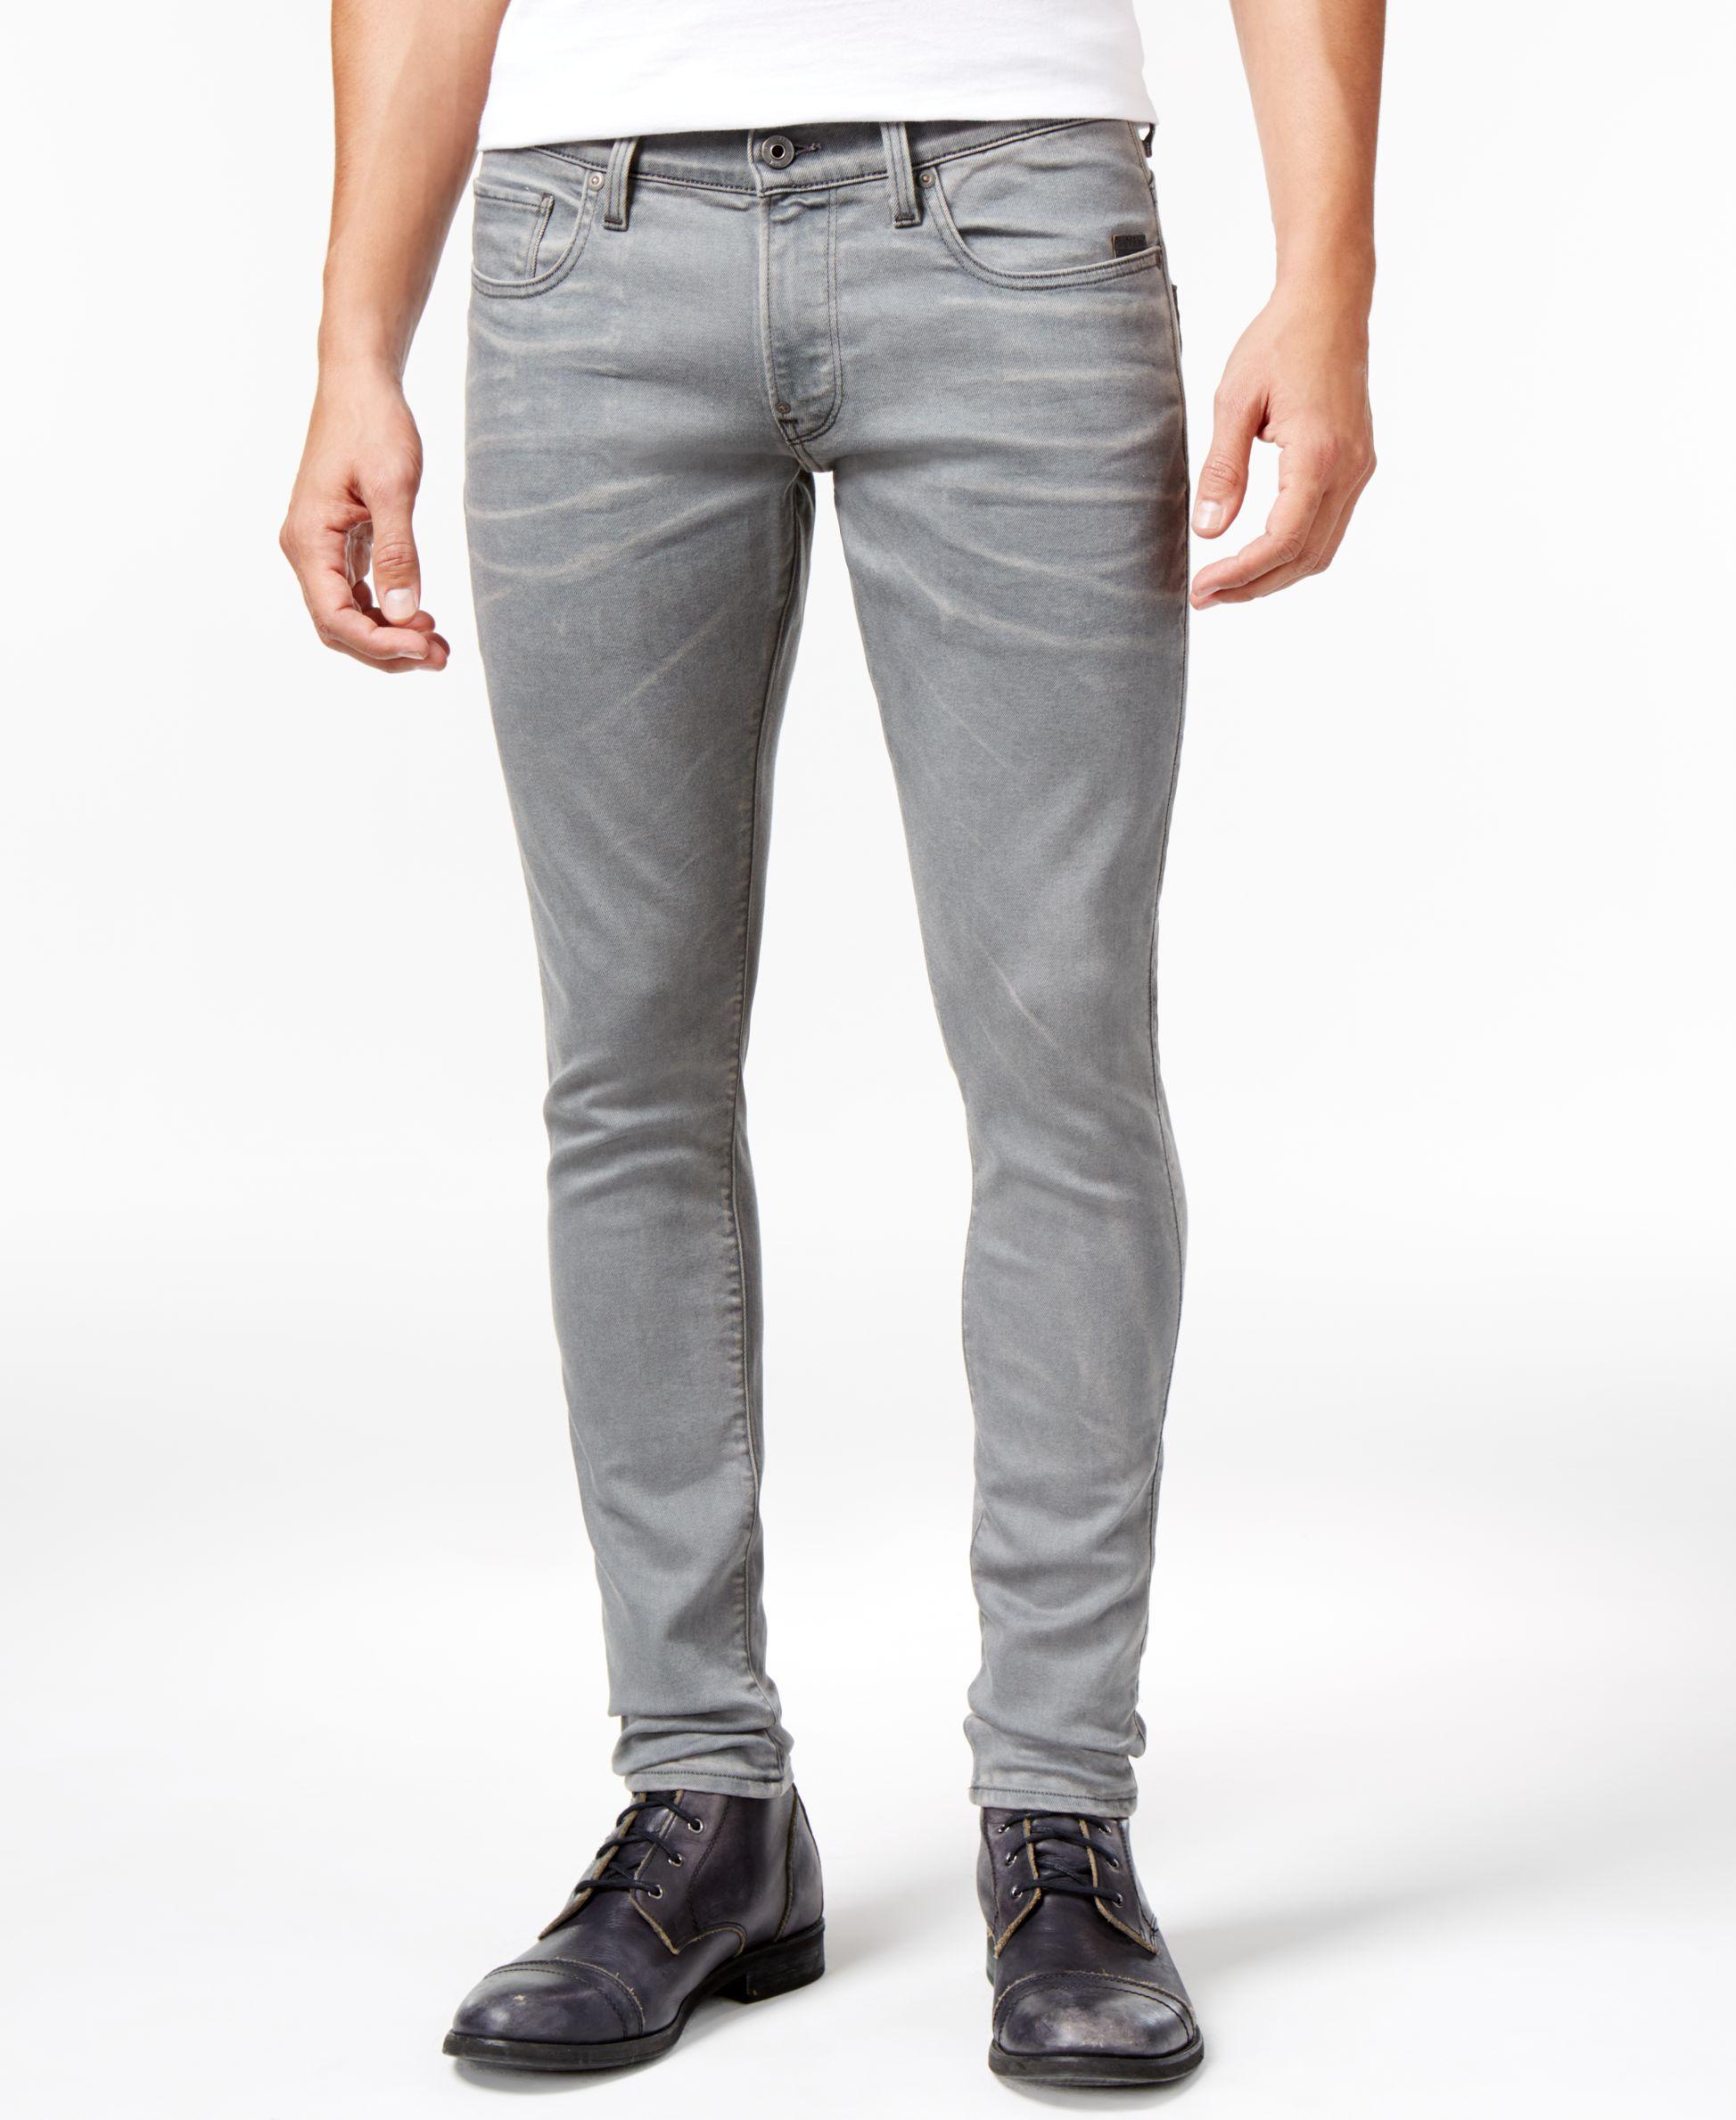 G Star Raw Men S Revend Super Slim Fit Jeans Skinny Jeans Men Slim Fit Jeans